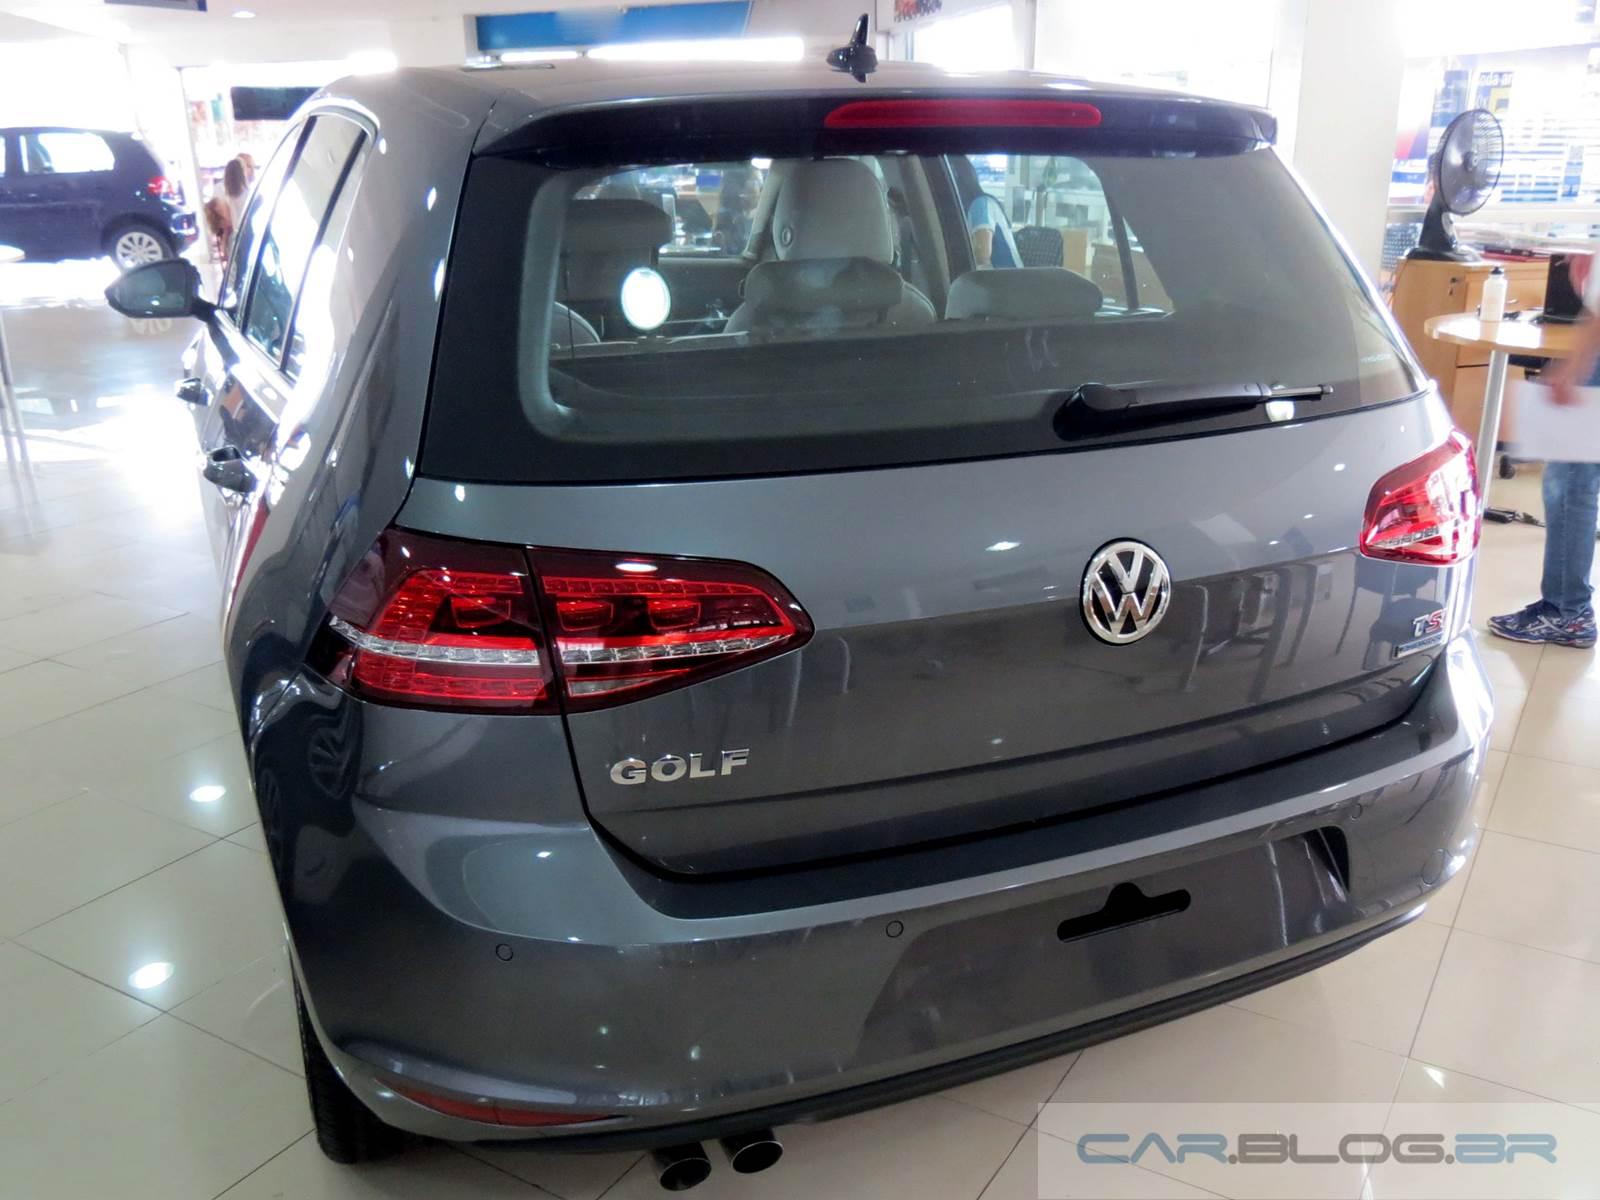 VW Golf 2015 Highline Exclusive: vídeo e detalhes internos   CAR.BLOG ...